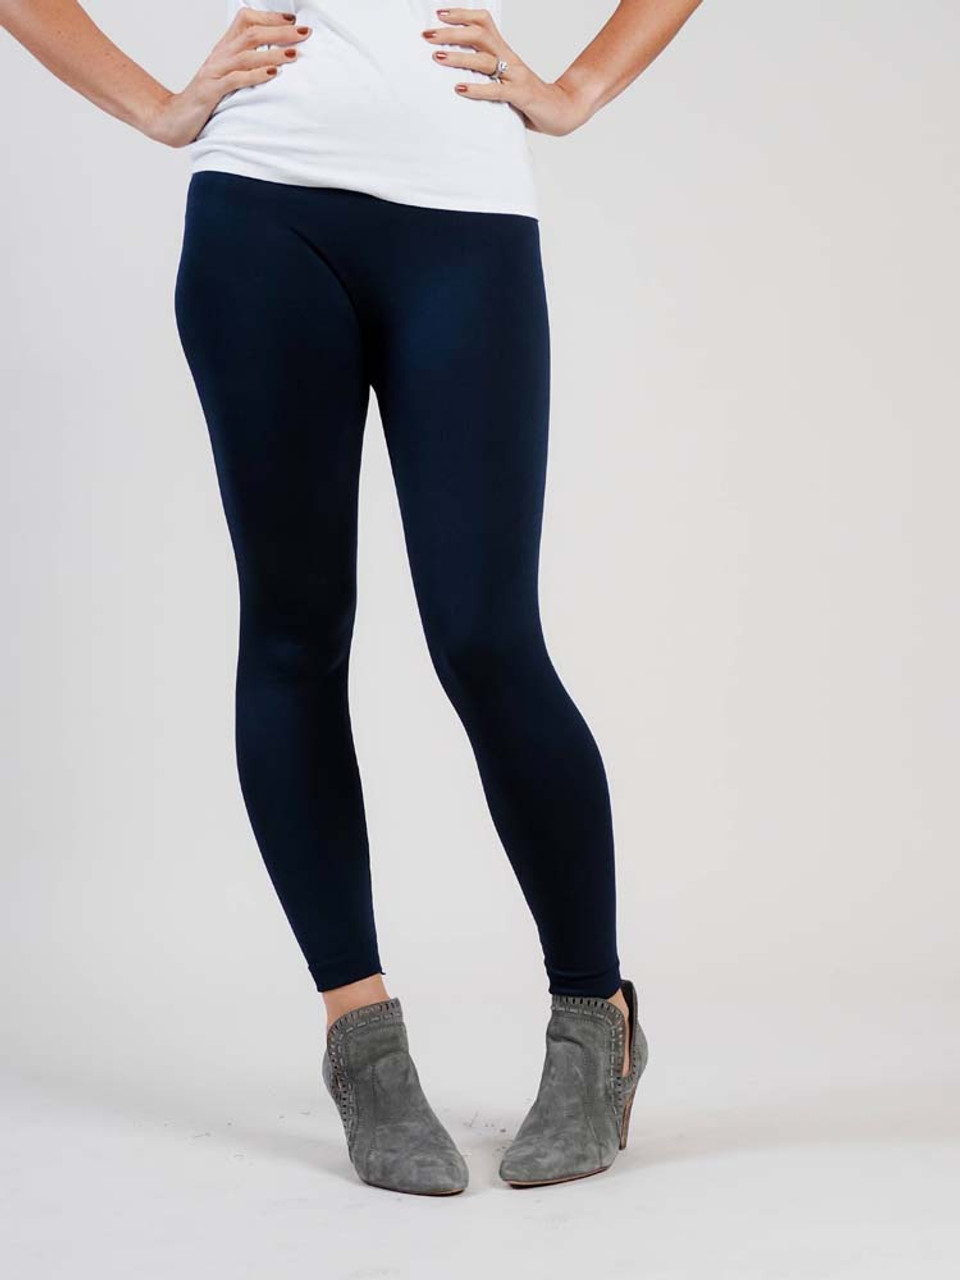 navy fleece lined leggings